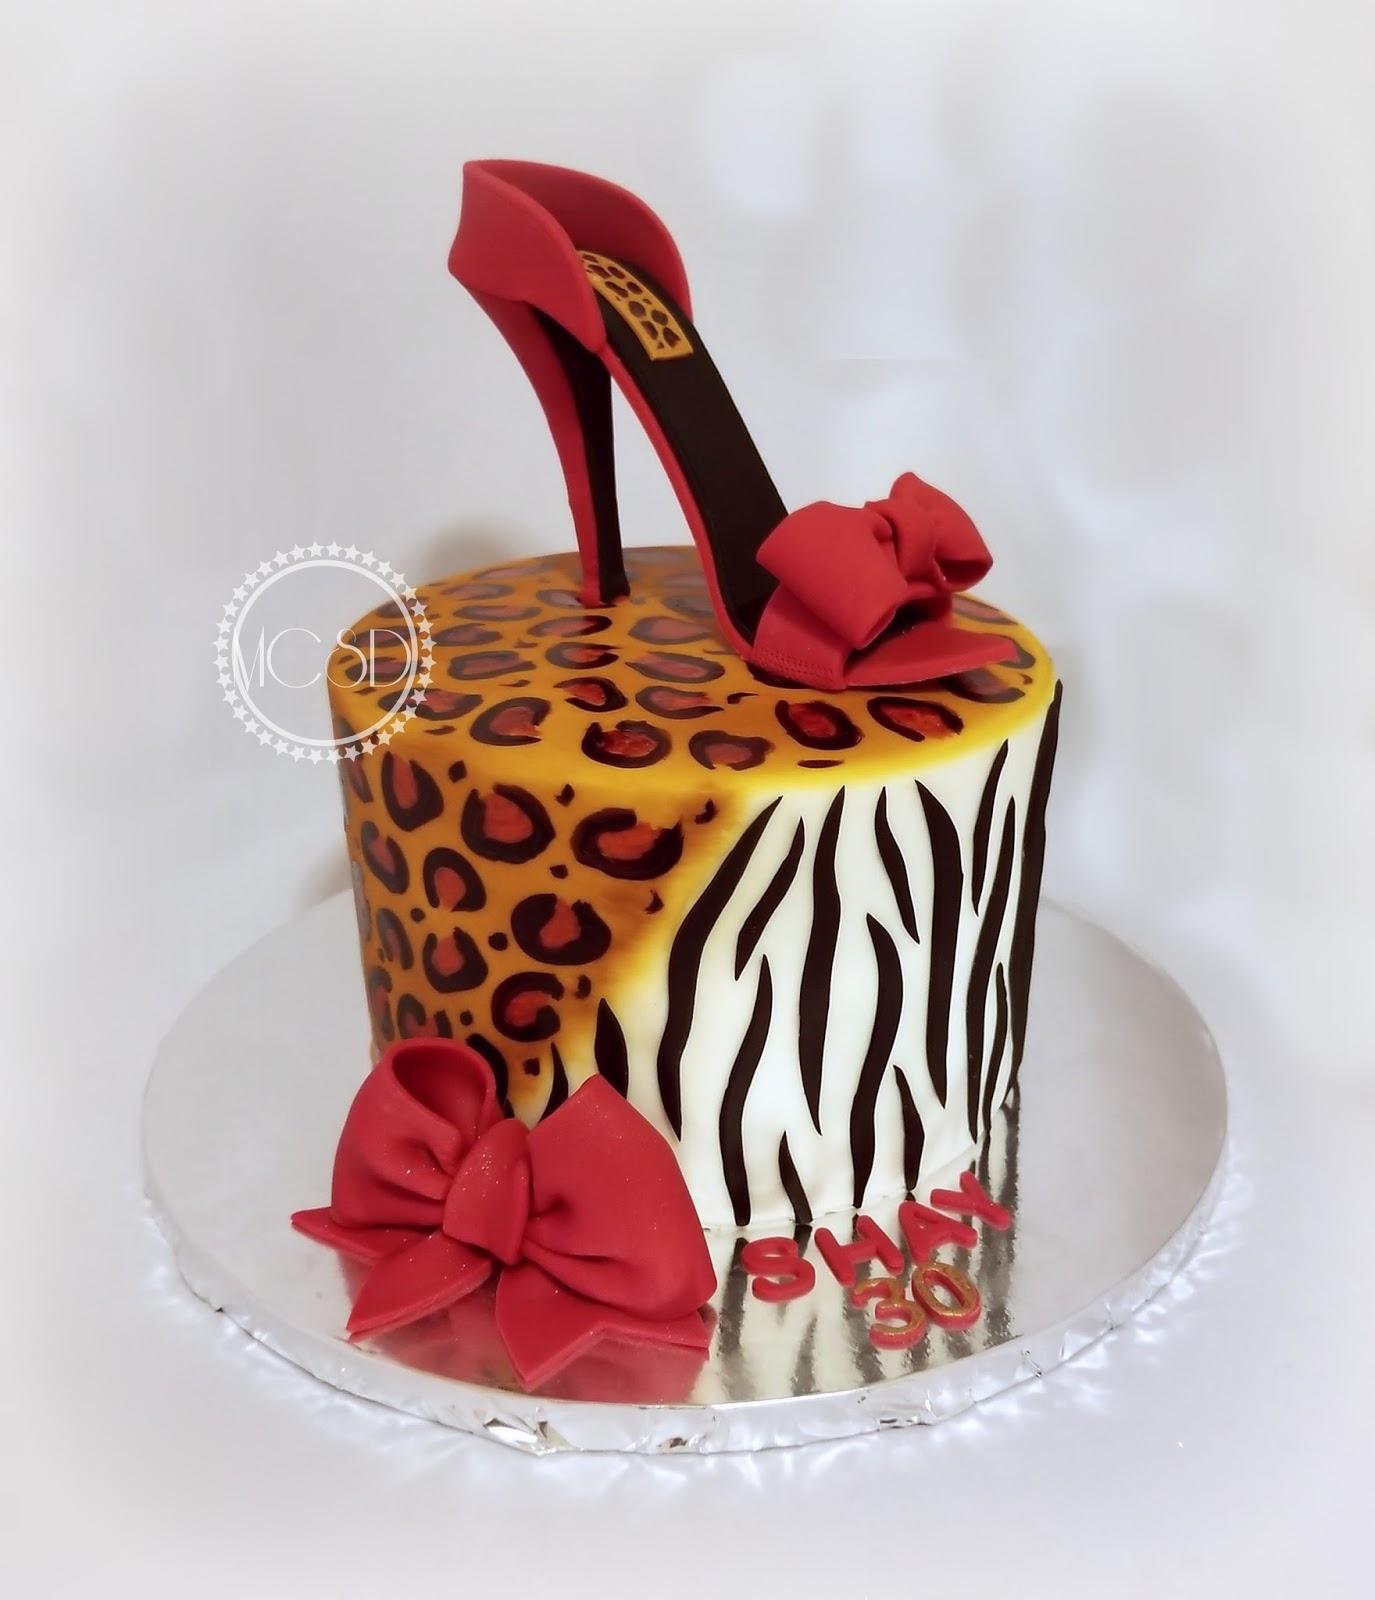 Cakesbyzana Leopard And Zebra Print Birthday Cake With High Heel Shoe